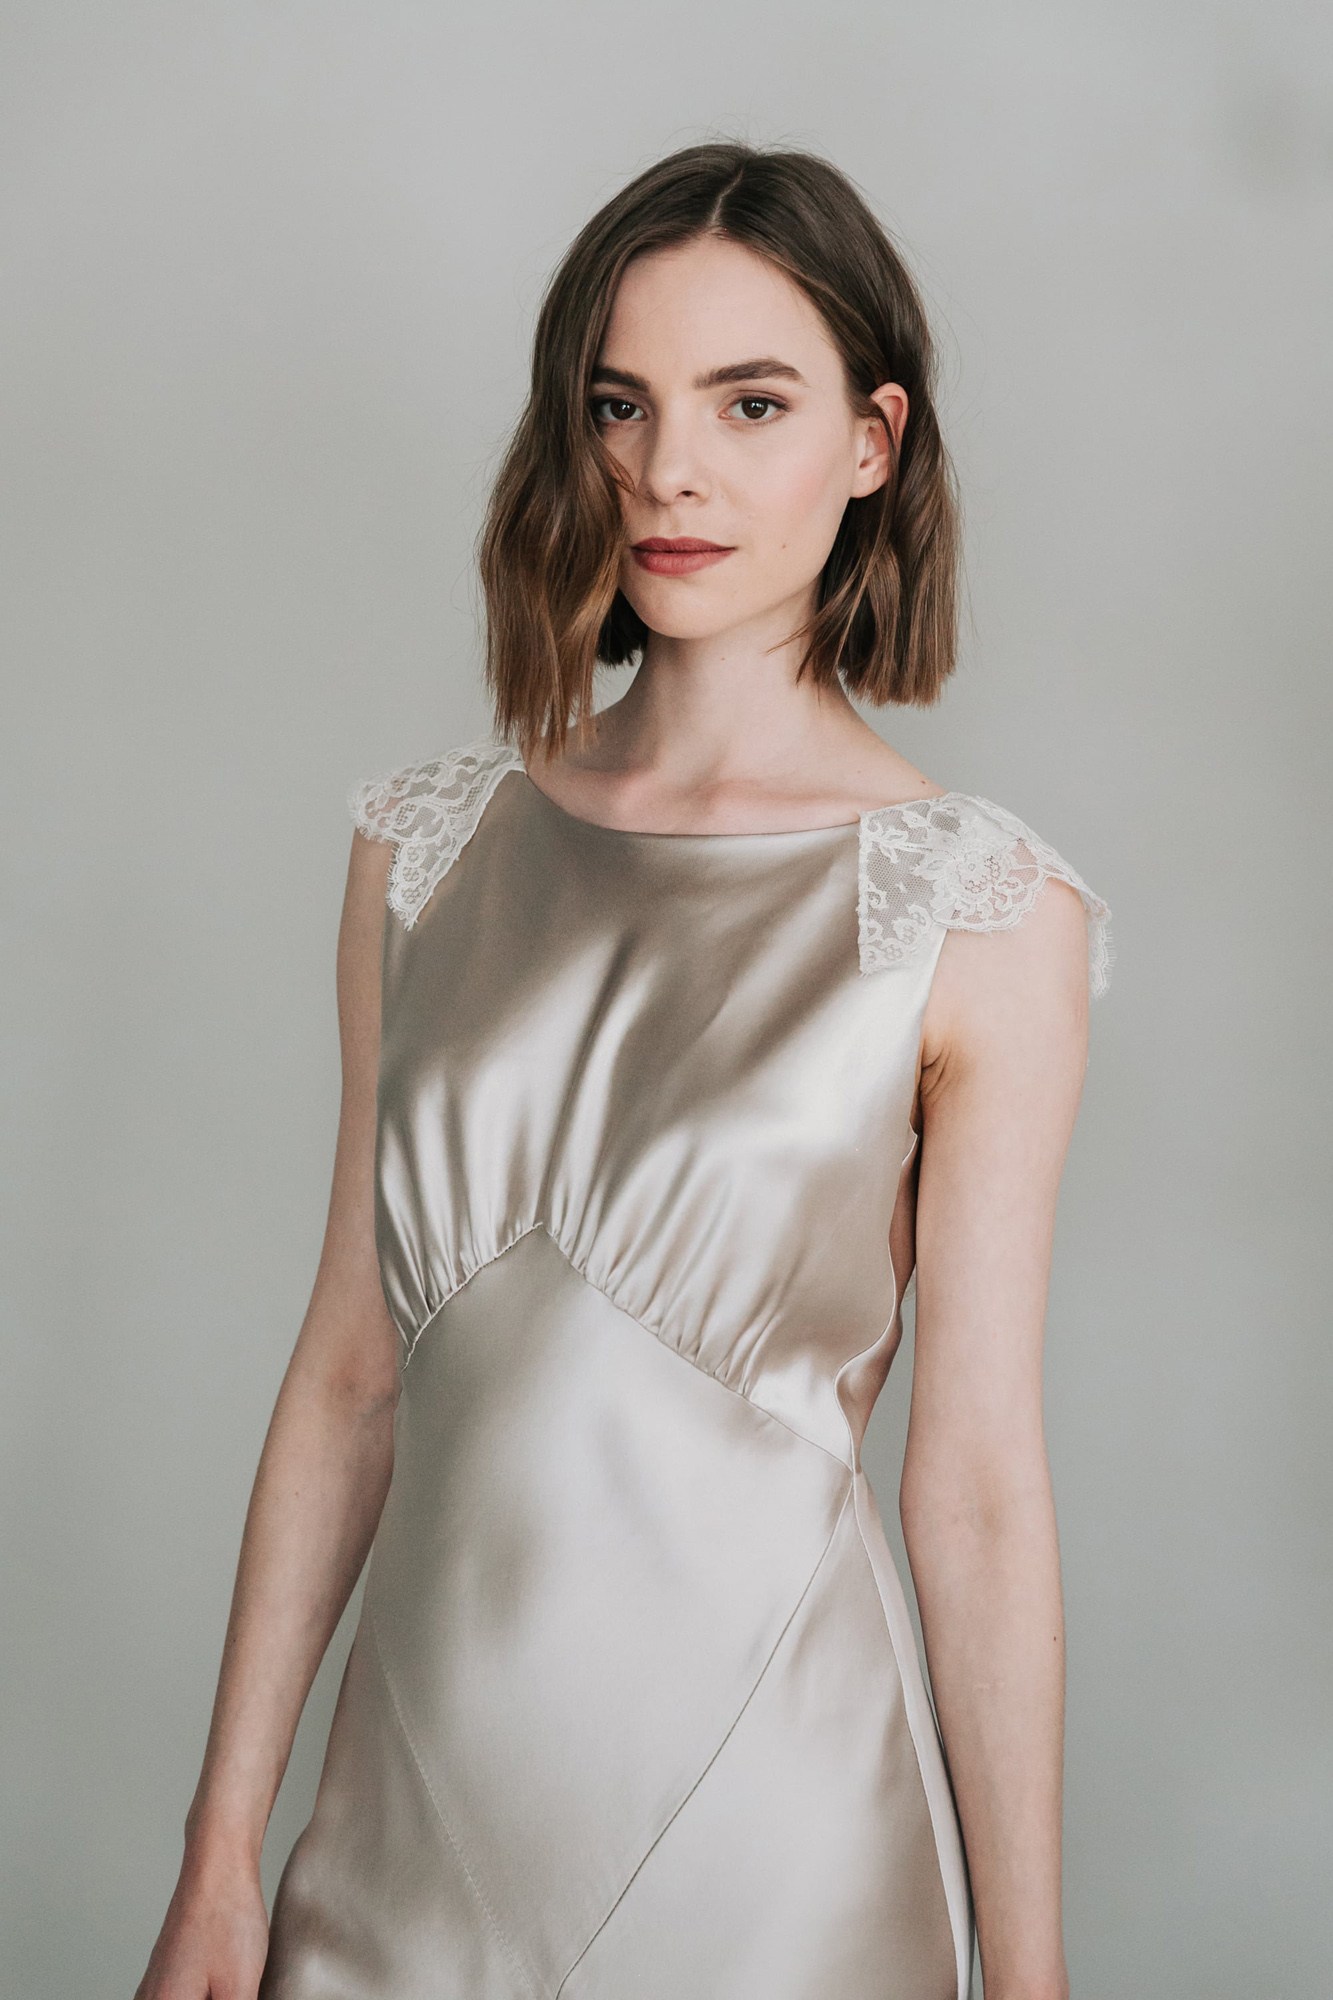 Kate-Beaumont-Sheffield-Honeysuckle-Bias-Cut-Silk-Panelled-Wedding-Gown-5.jpg